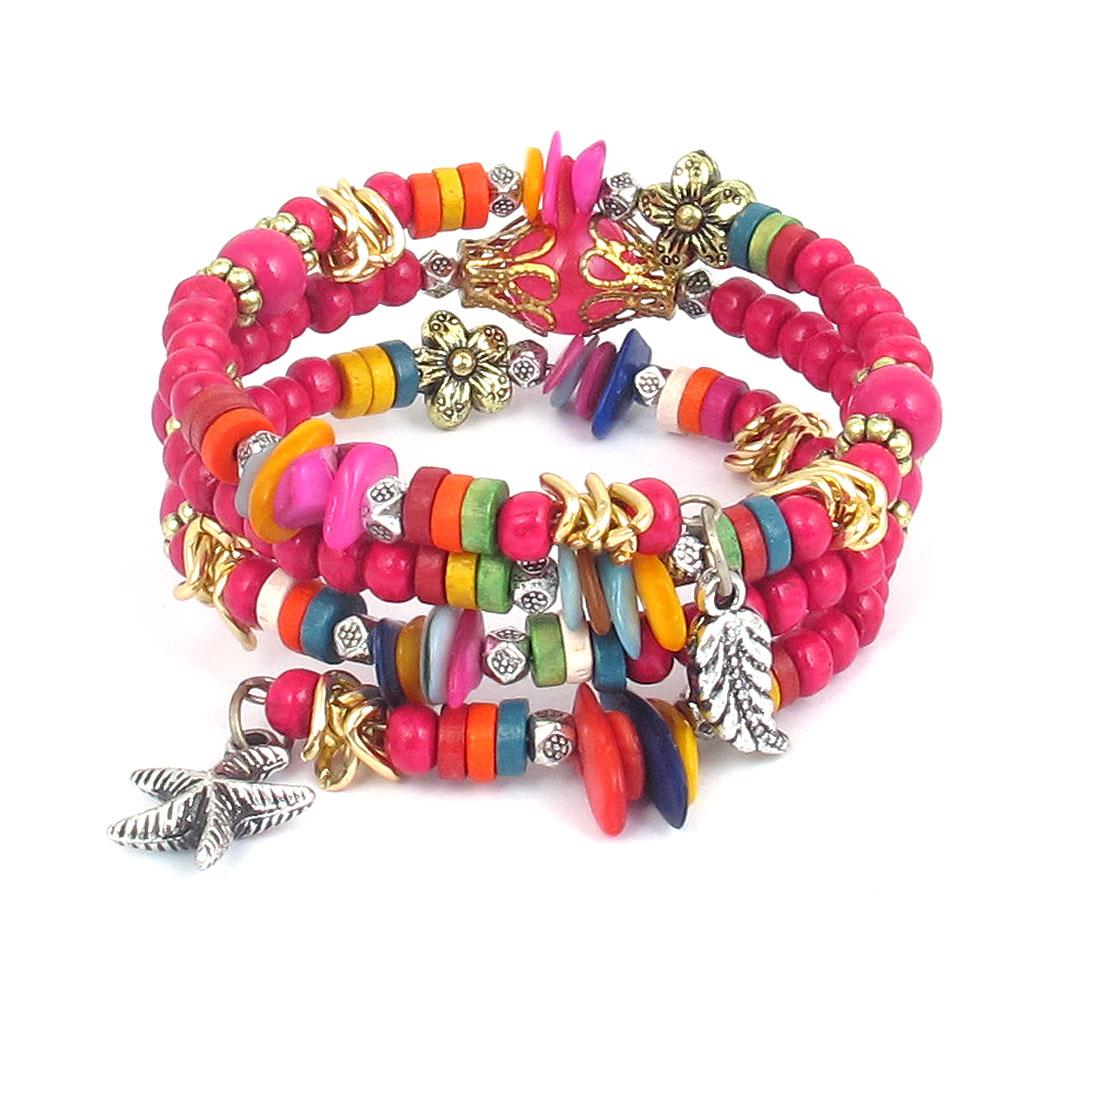 Women Manmade Wood Round Beads Pentacle Leaf Decor 3-layer Wrist Ornament Bangle Bracelet Fuchsia